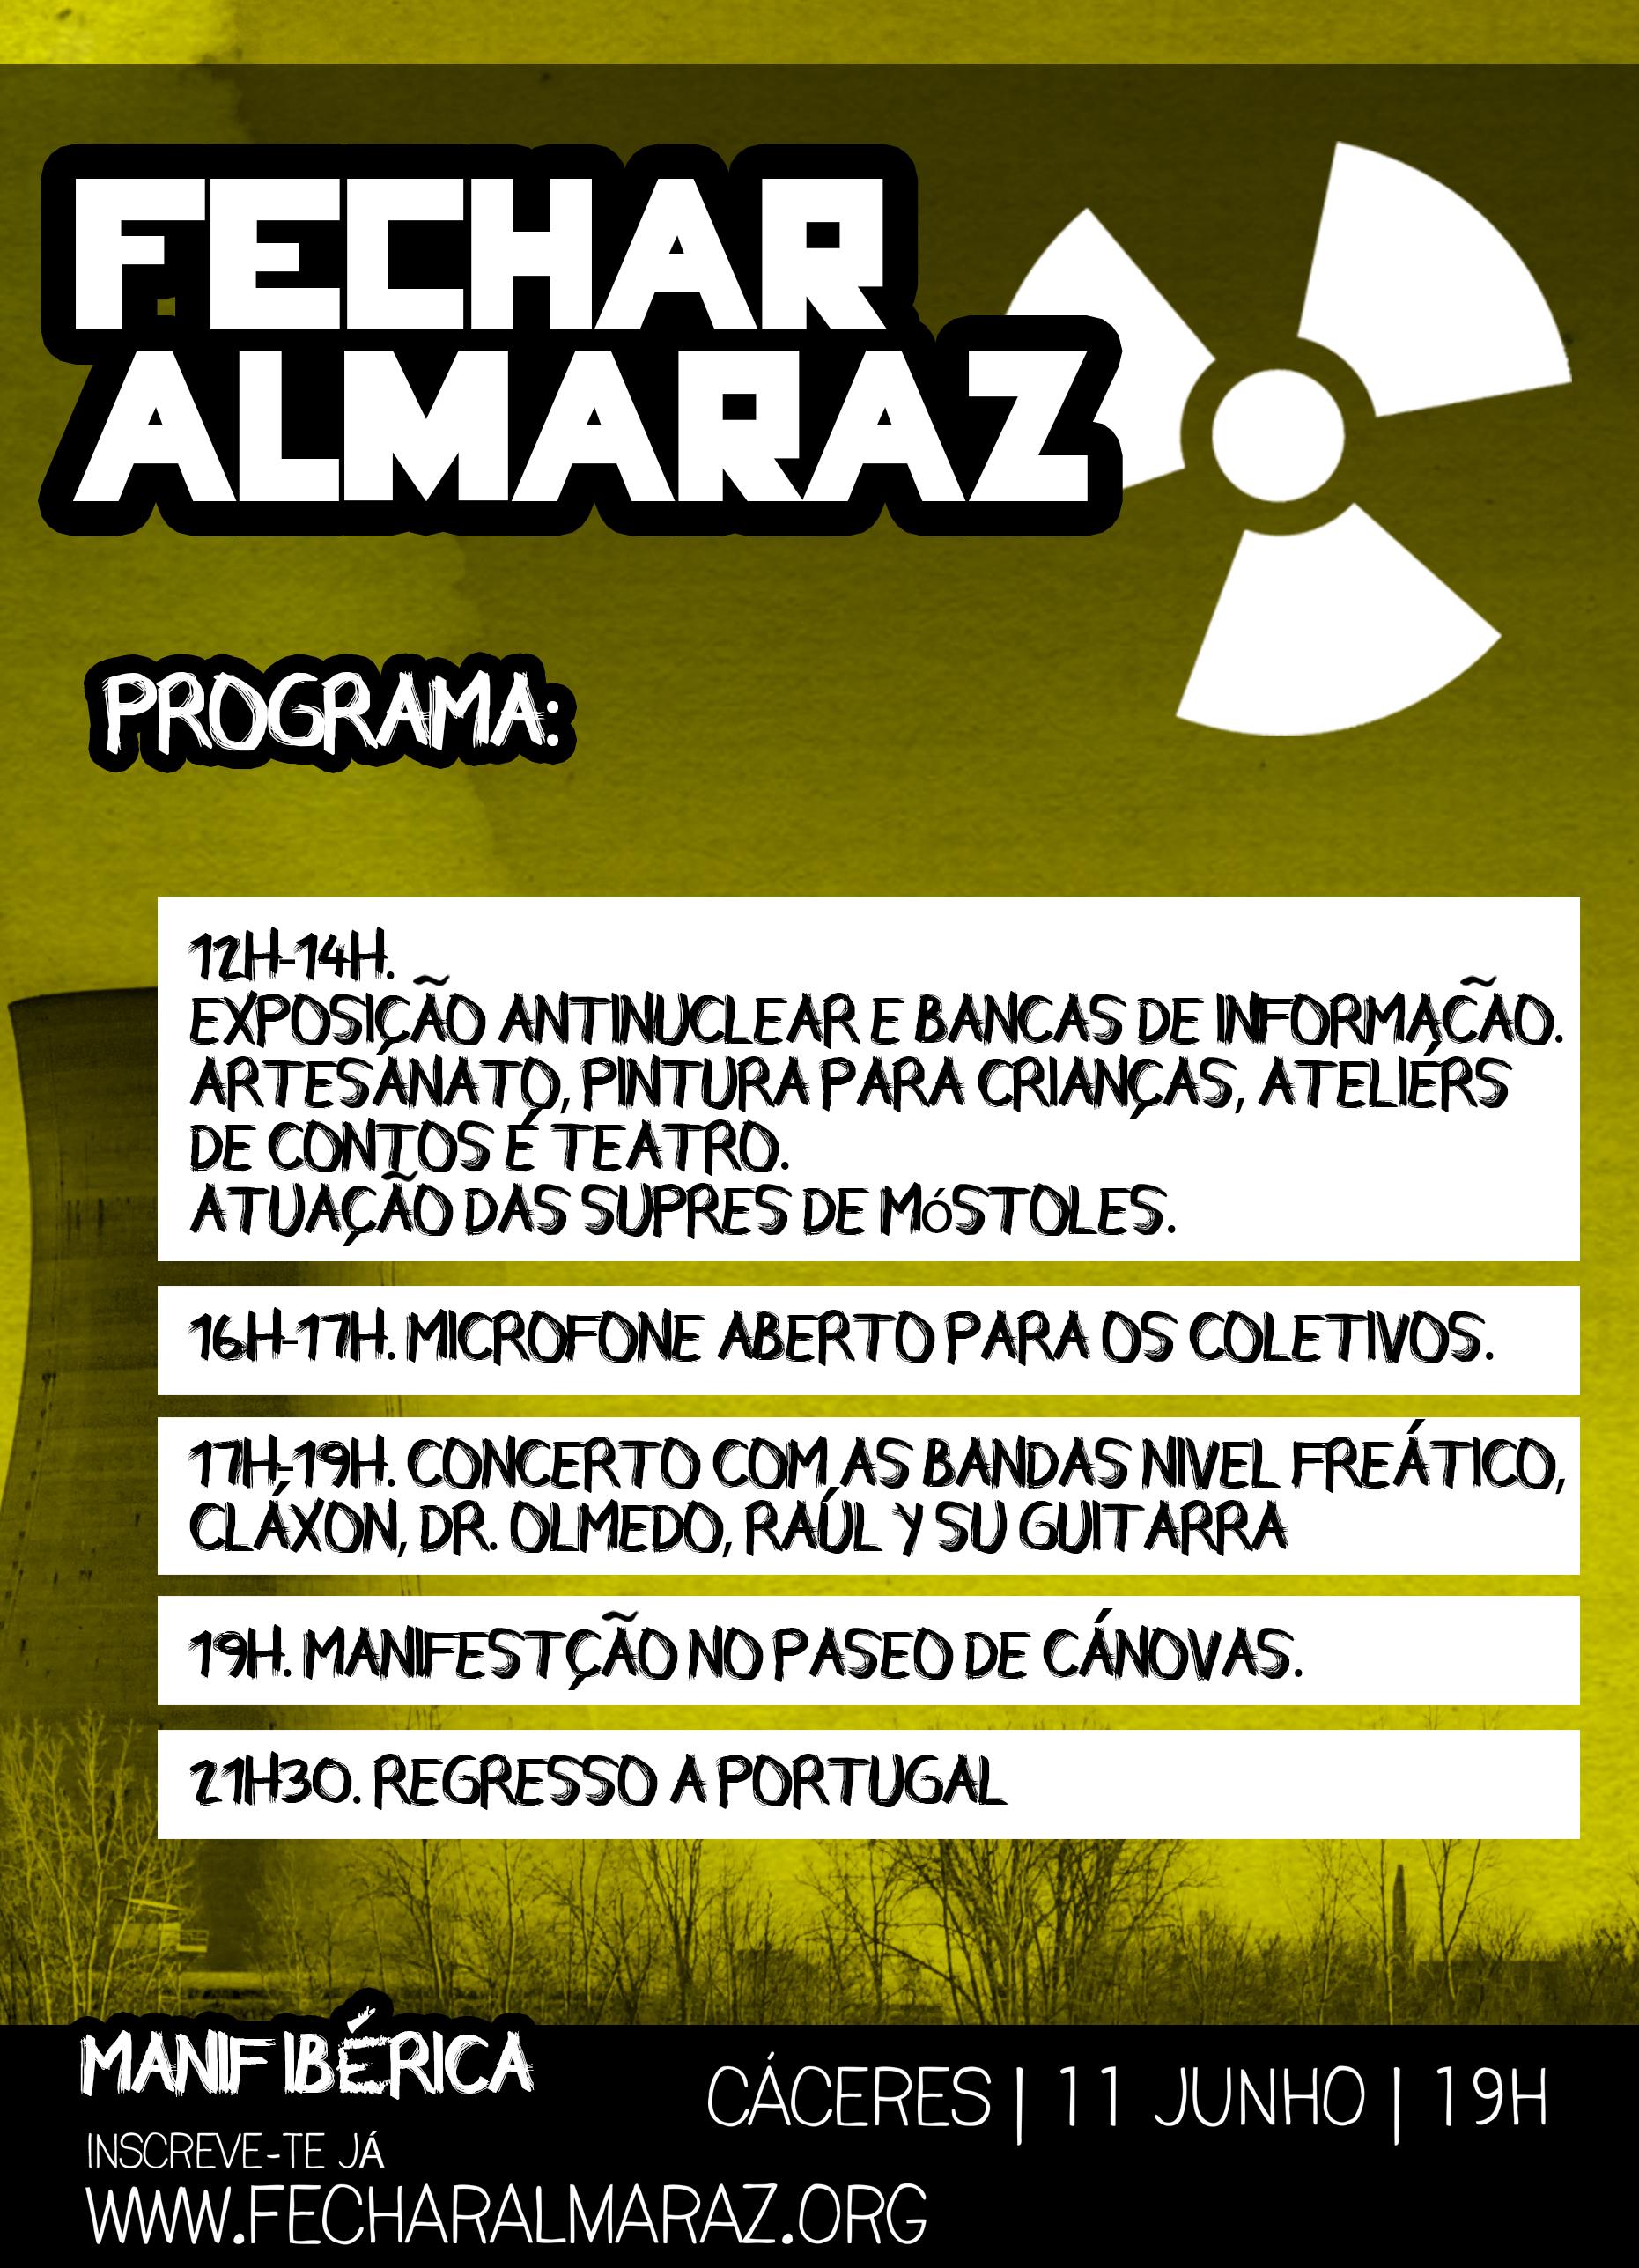 Almaraz Manif Ibérica Programa Cartaz (1)